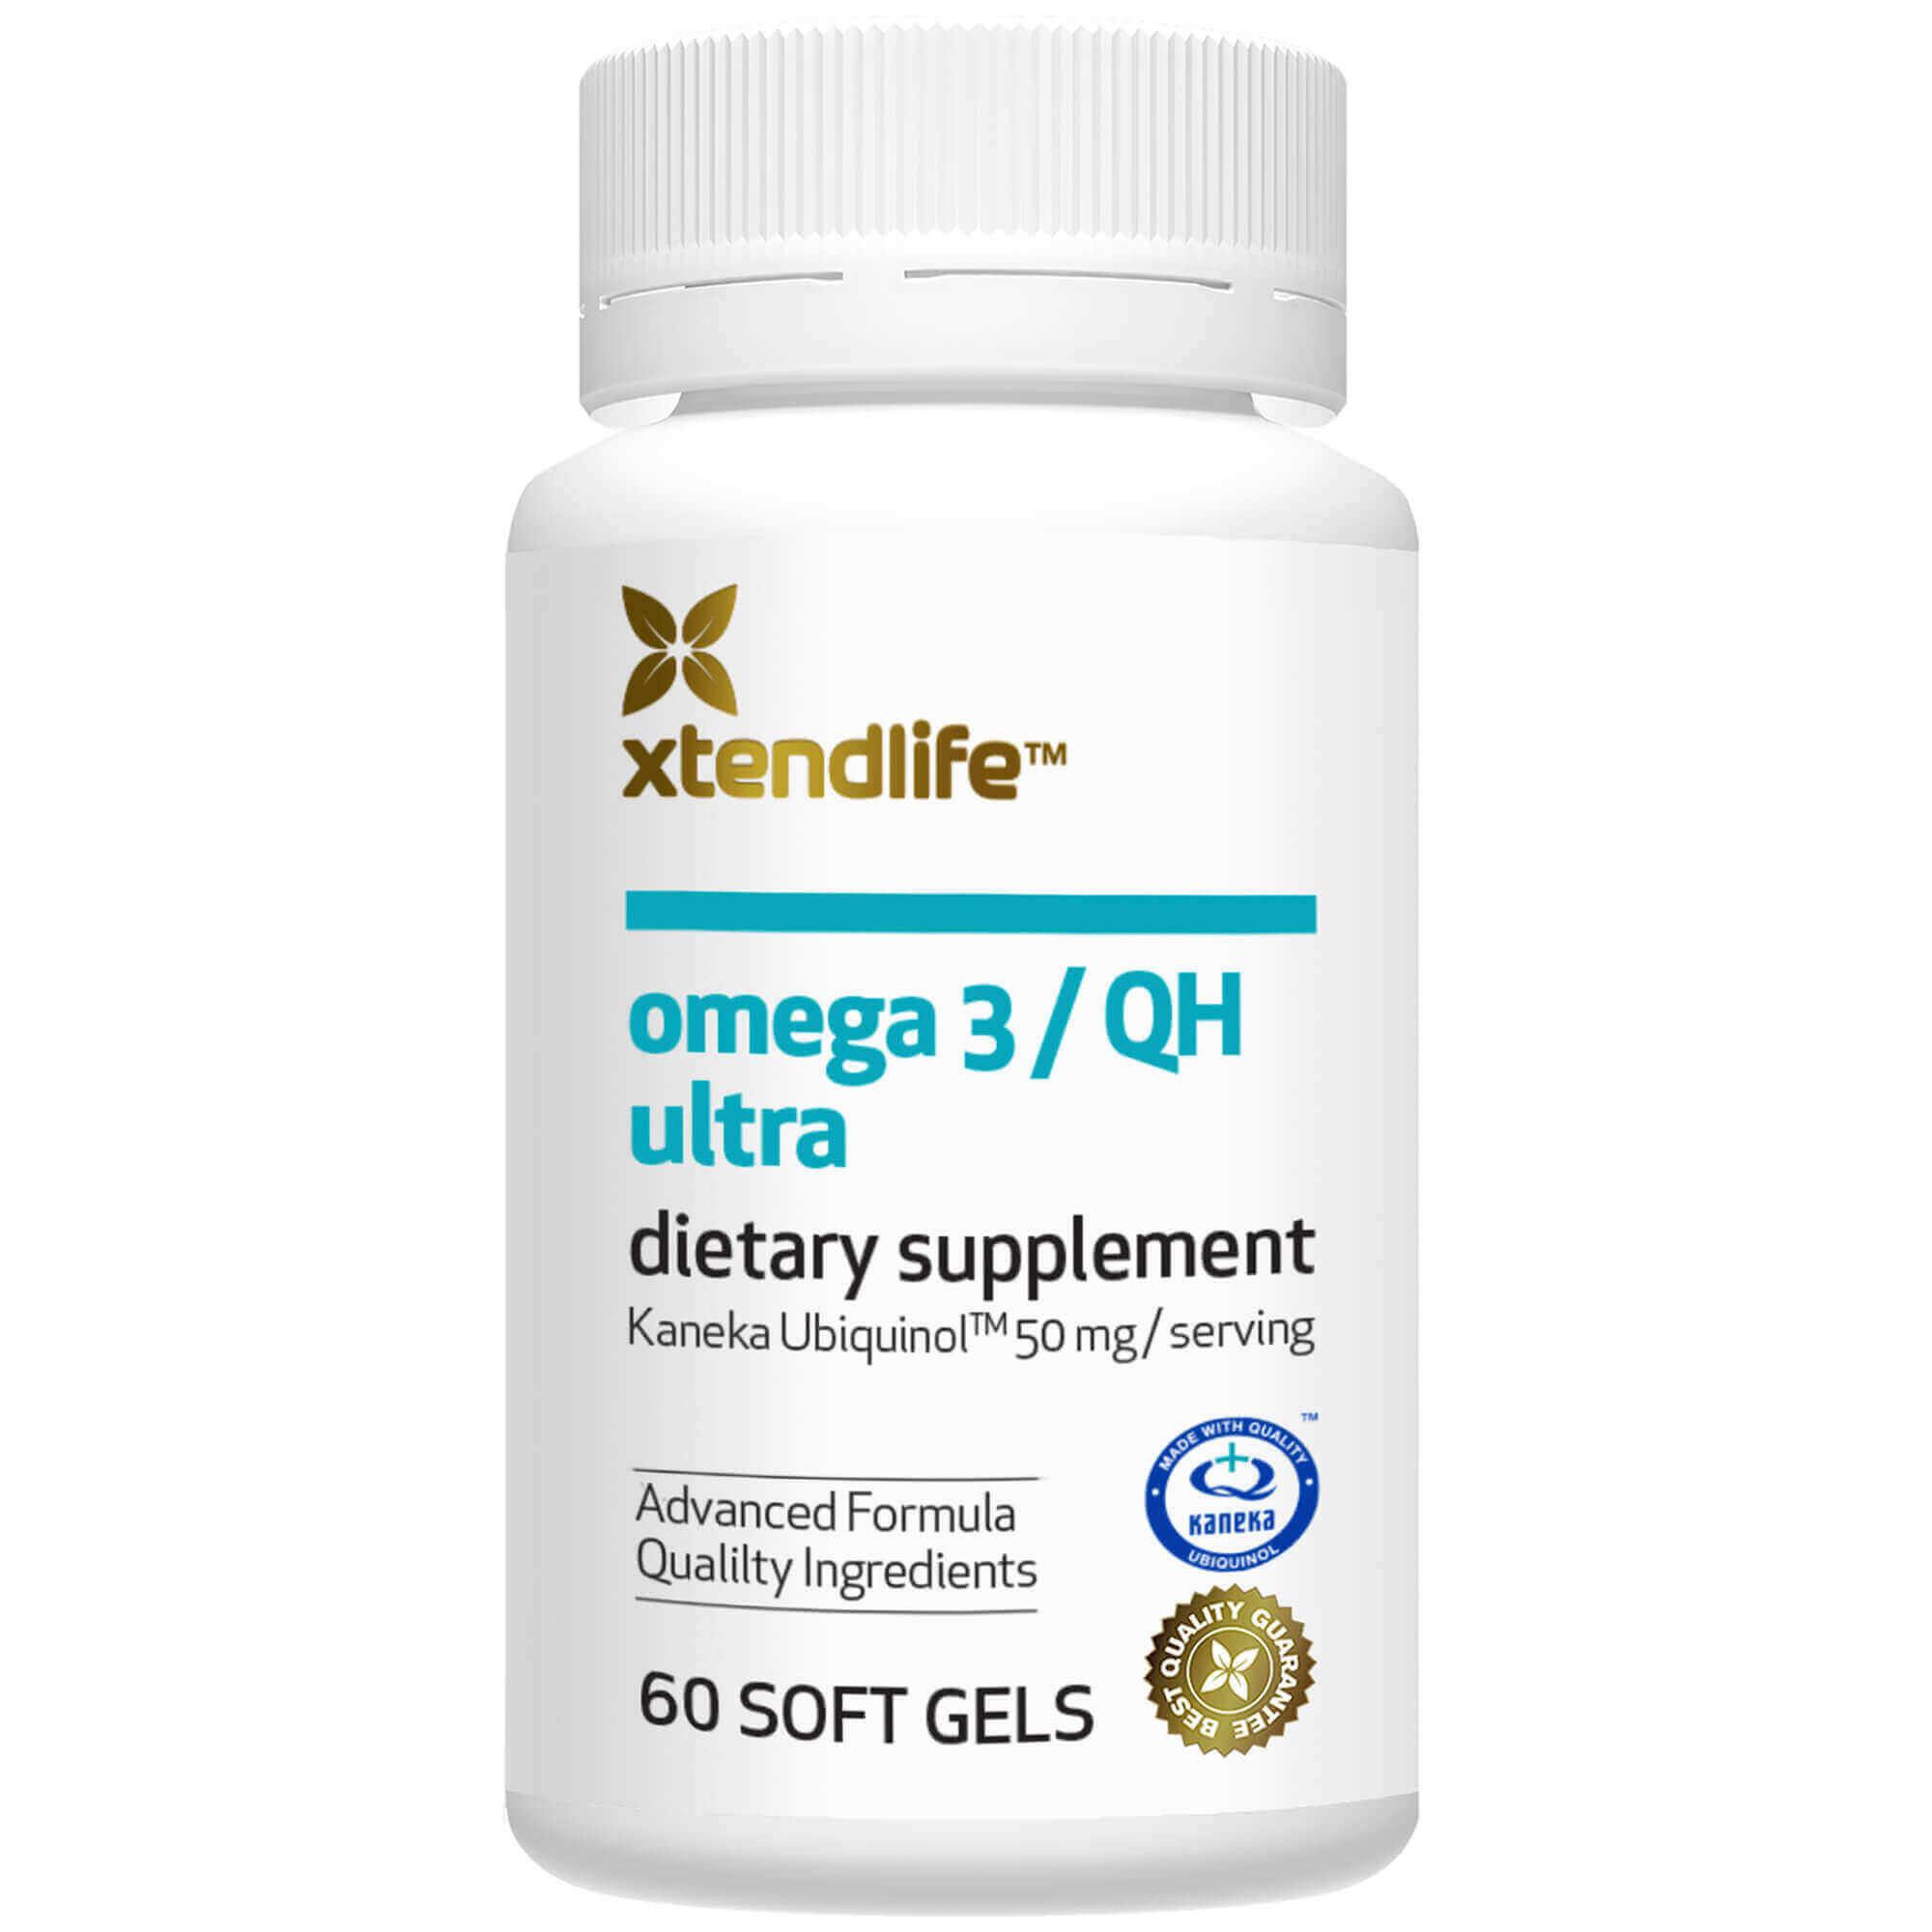 Xtend Life Omega 3 / QH Ultra